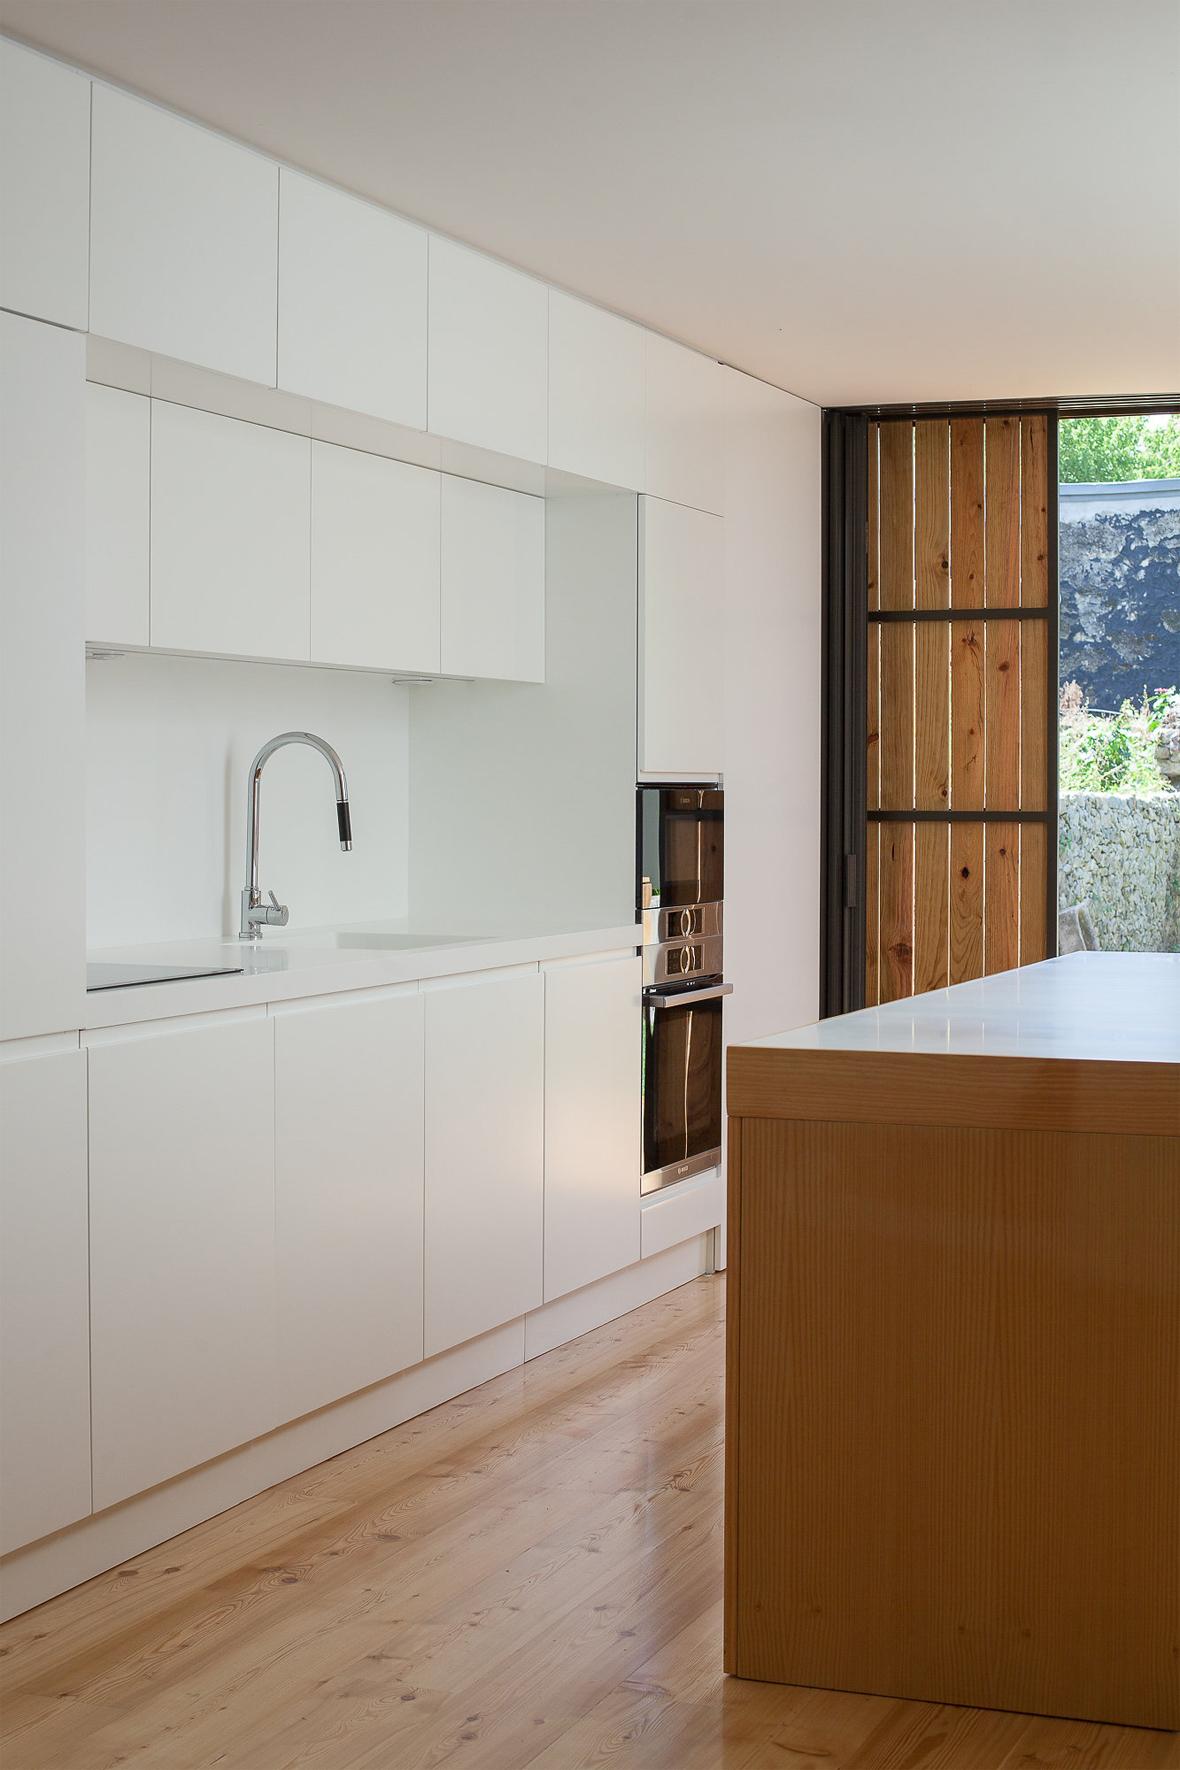 Boavista House by Pablo Pita Architects | METALOCUS